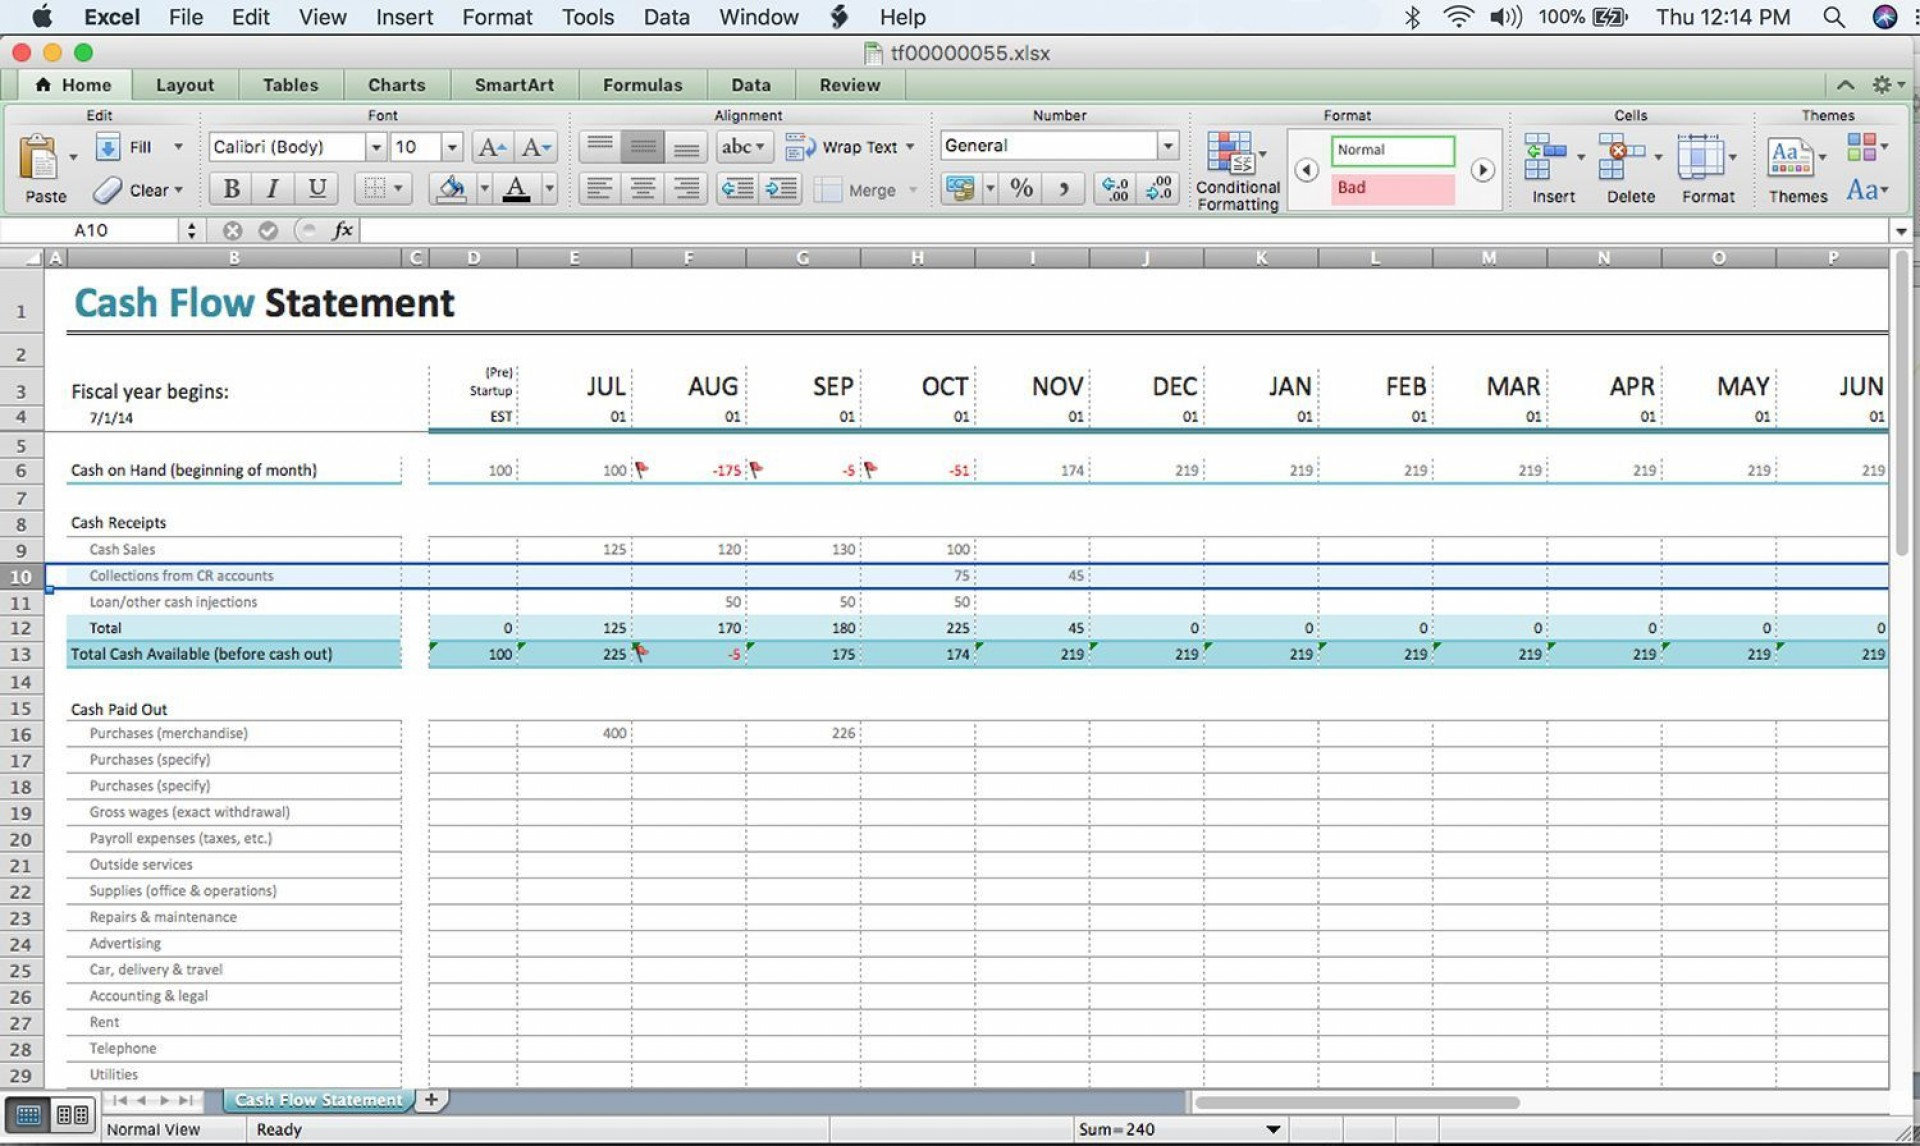 000 Excellent Cash Flow Template Excel Free Idea  Statement Download Format In1920